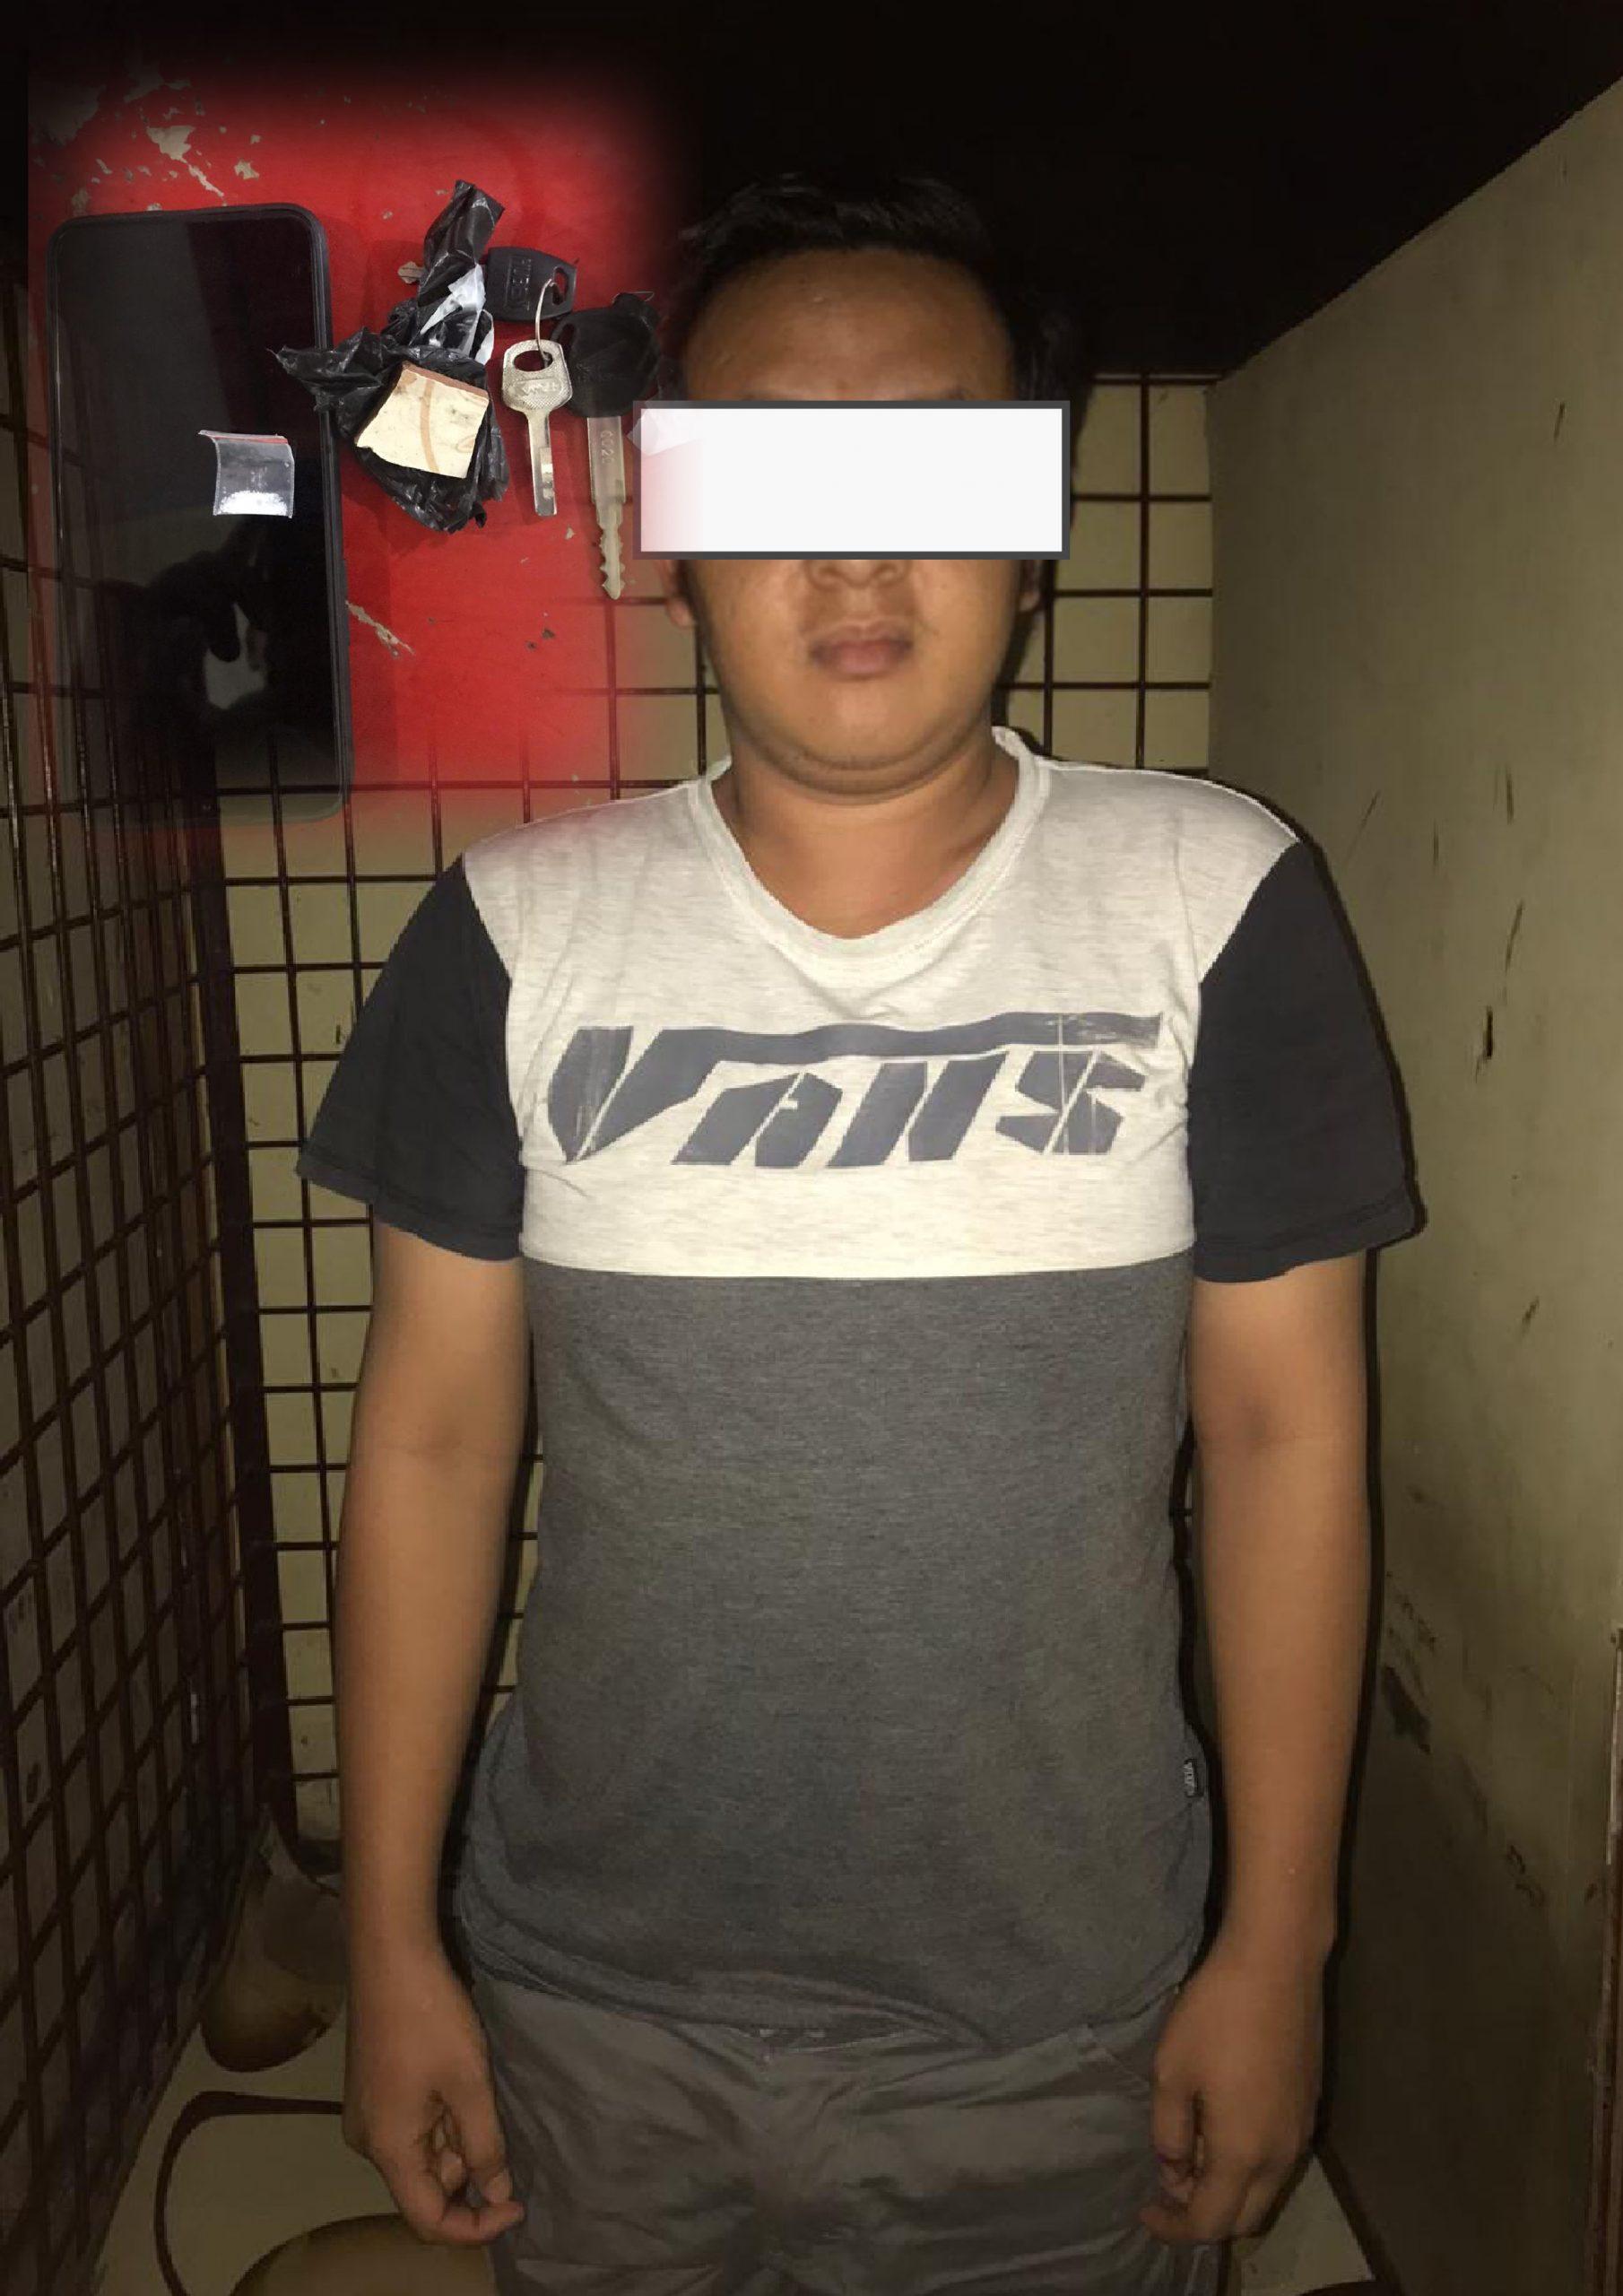 Tempo 3 Hari Empat Tersangka Penyalahgunaan Narkotika Ditangkap Polda Bengkulu